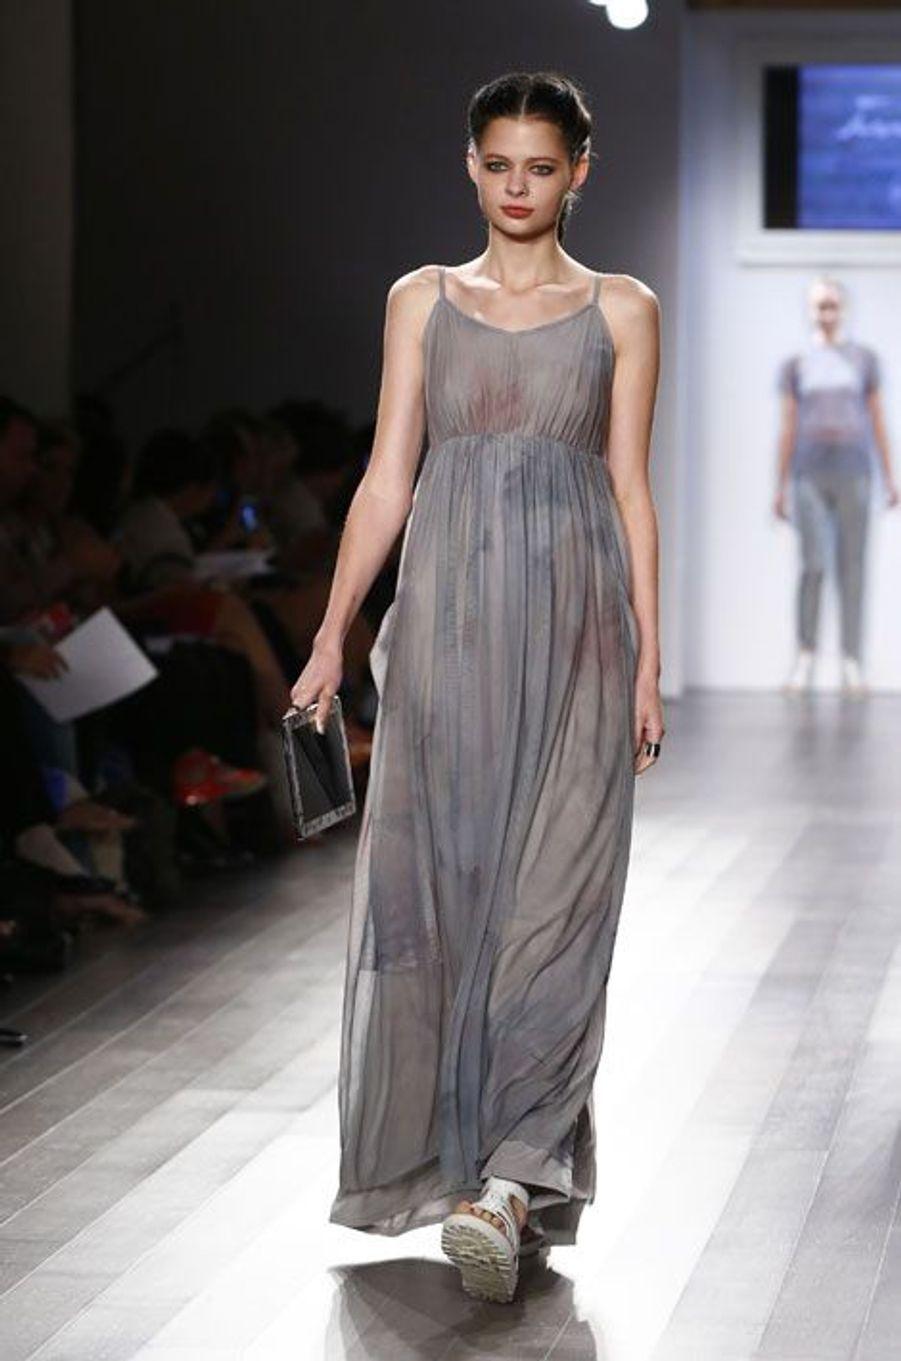 Isabella Rose Taylor, l'enfant prodige de la mode